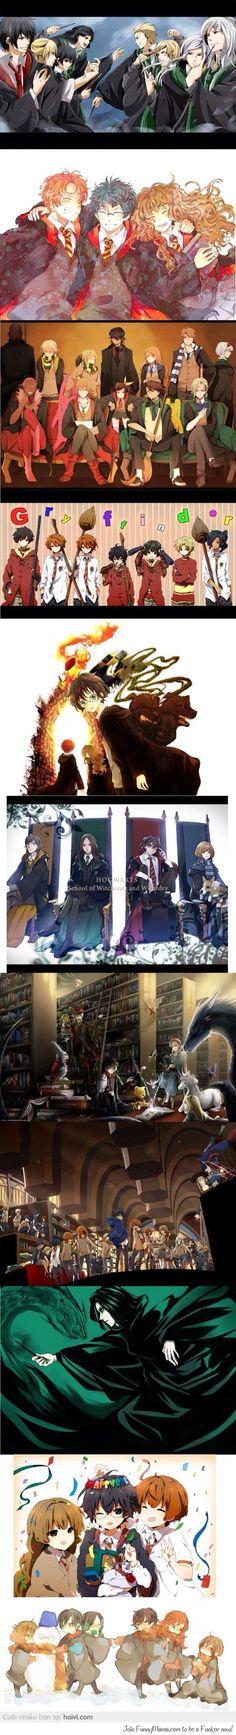 HP, anime style!